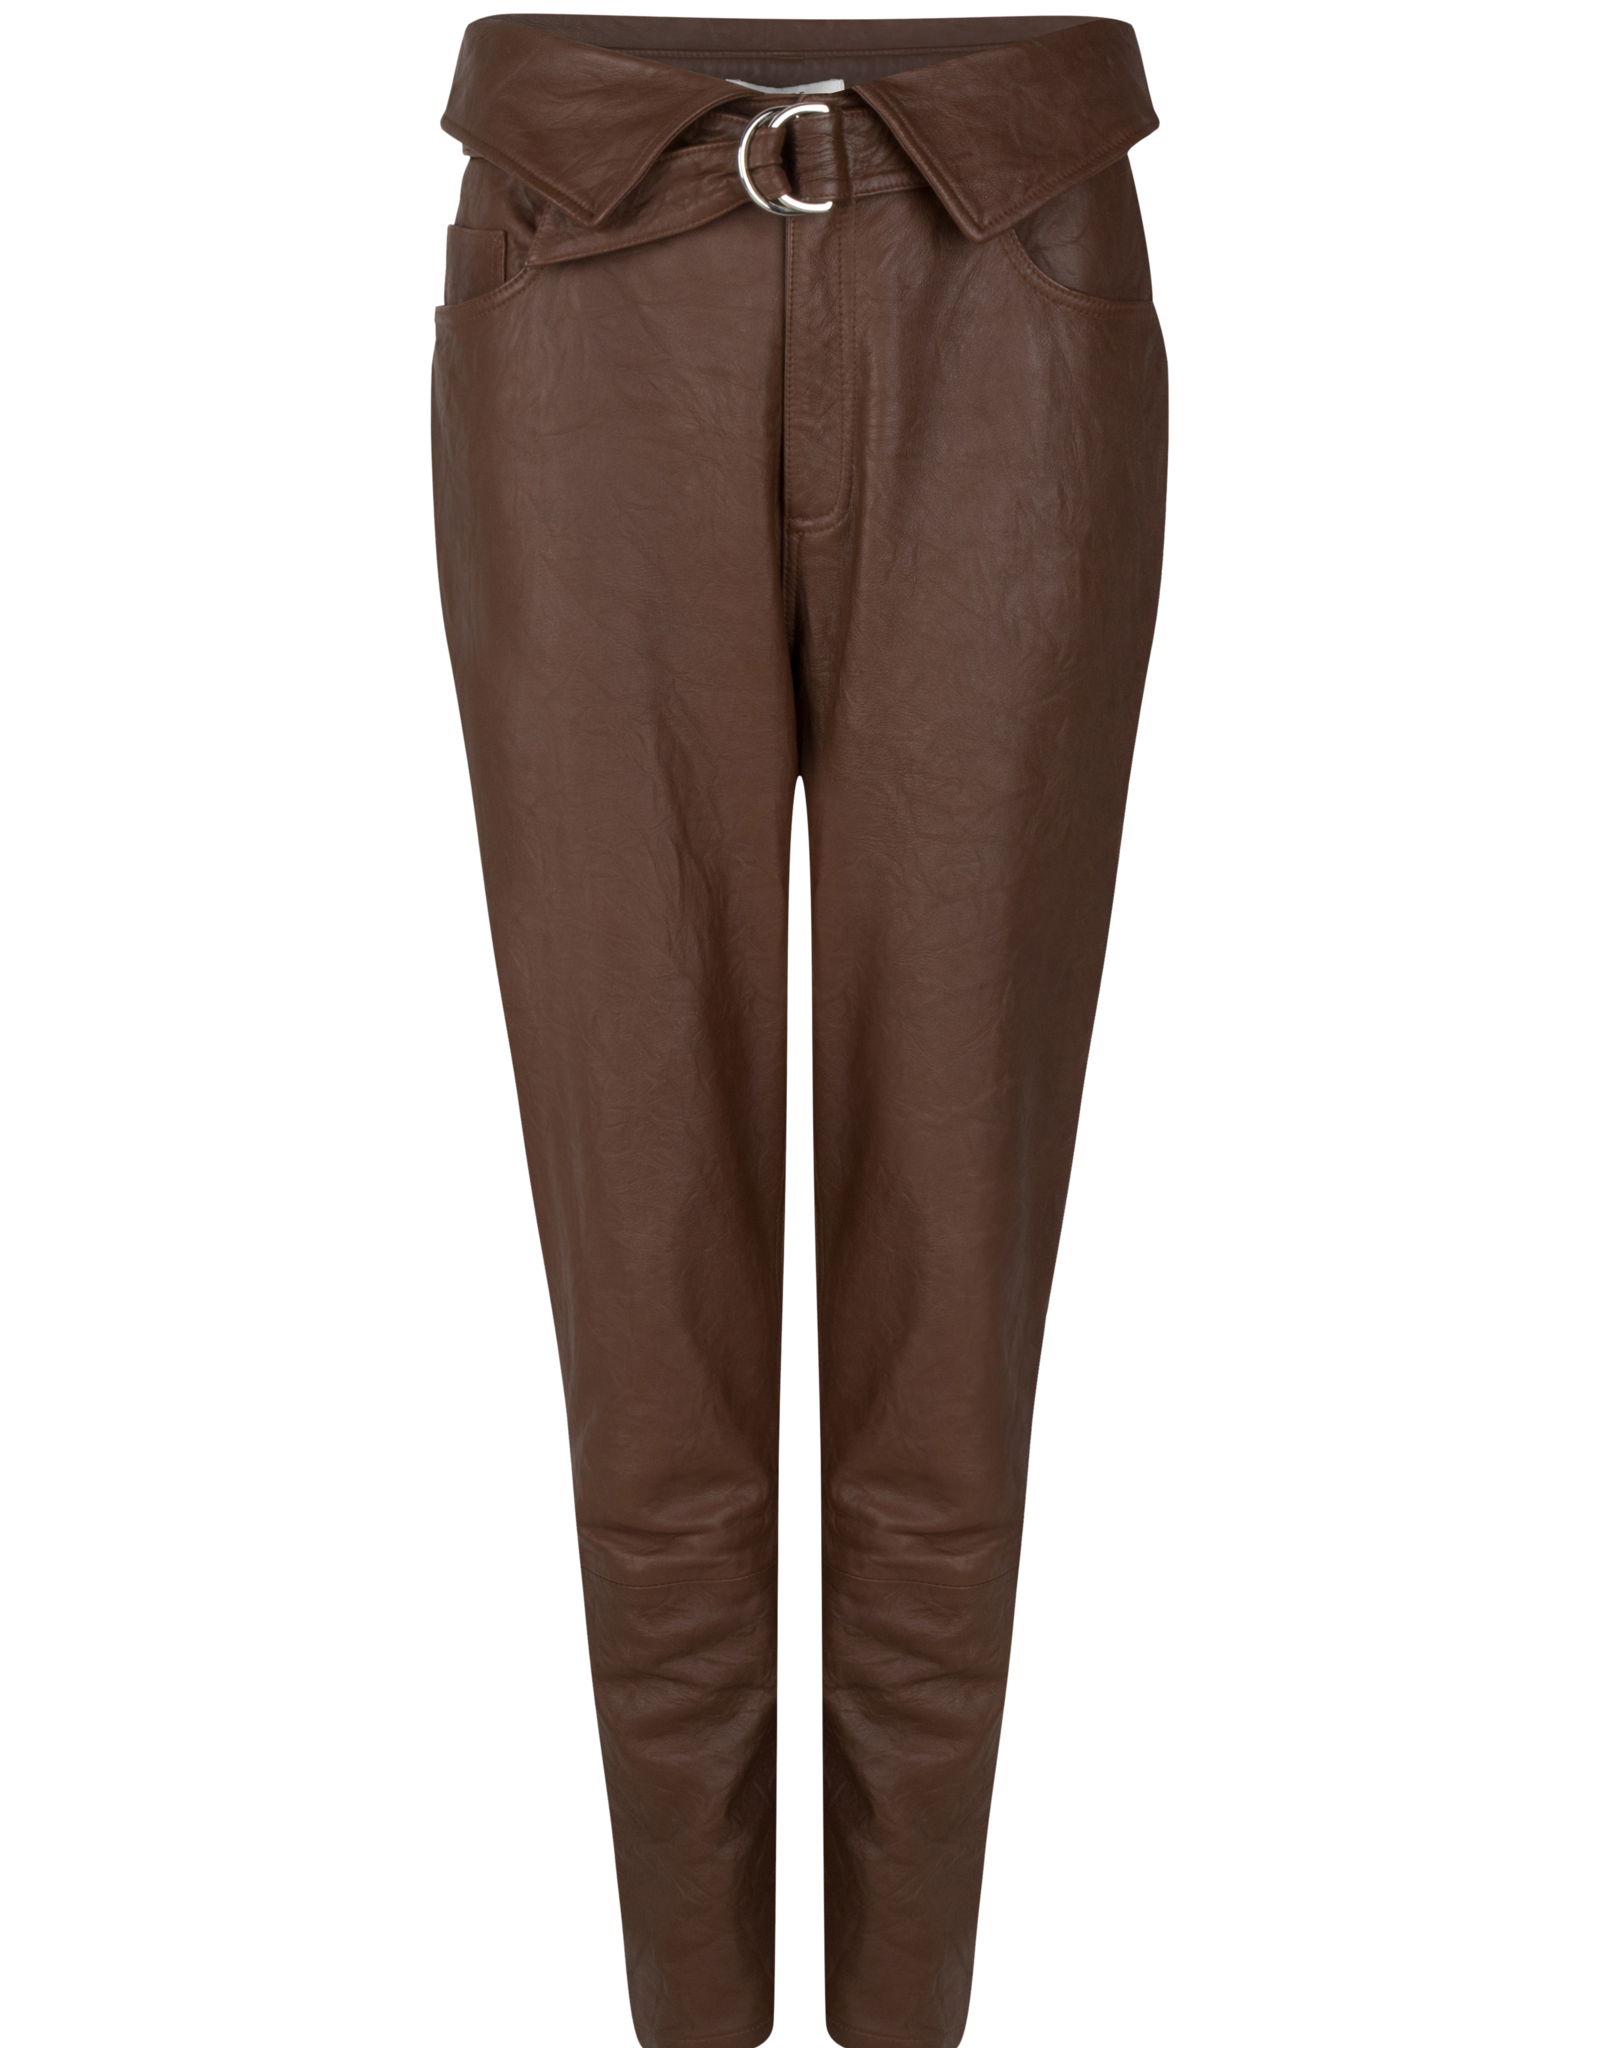 Dante6 Zola leather pants